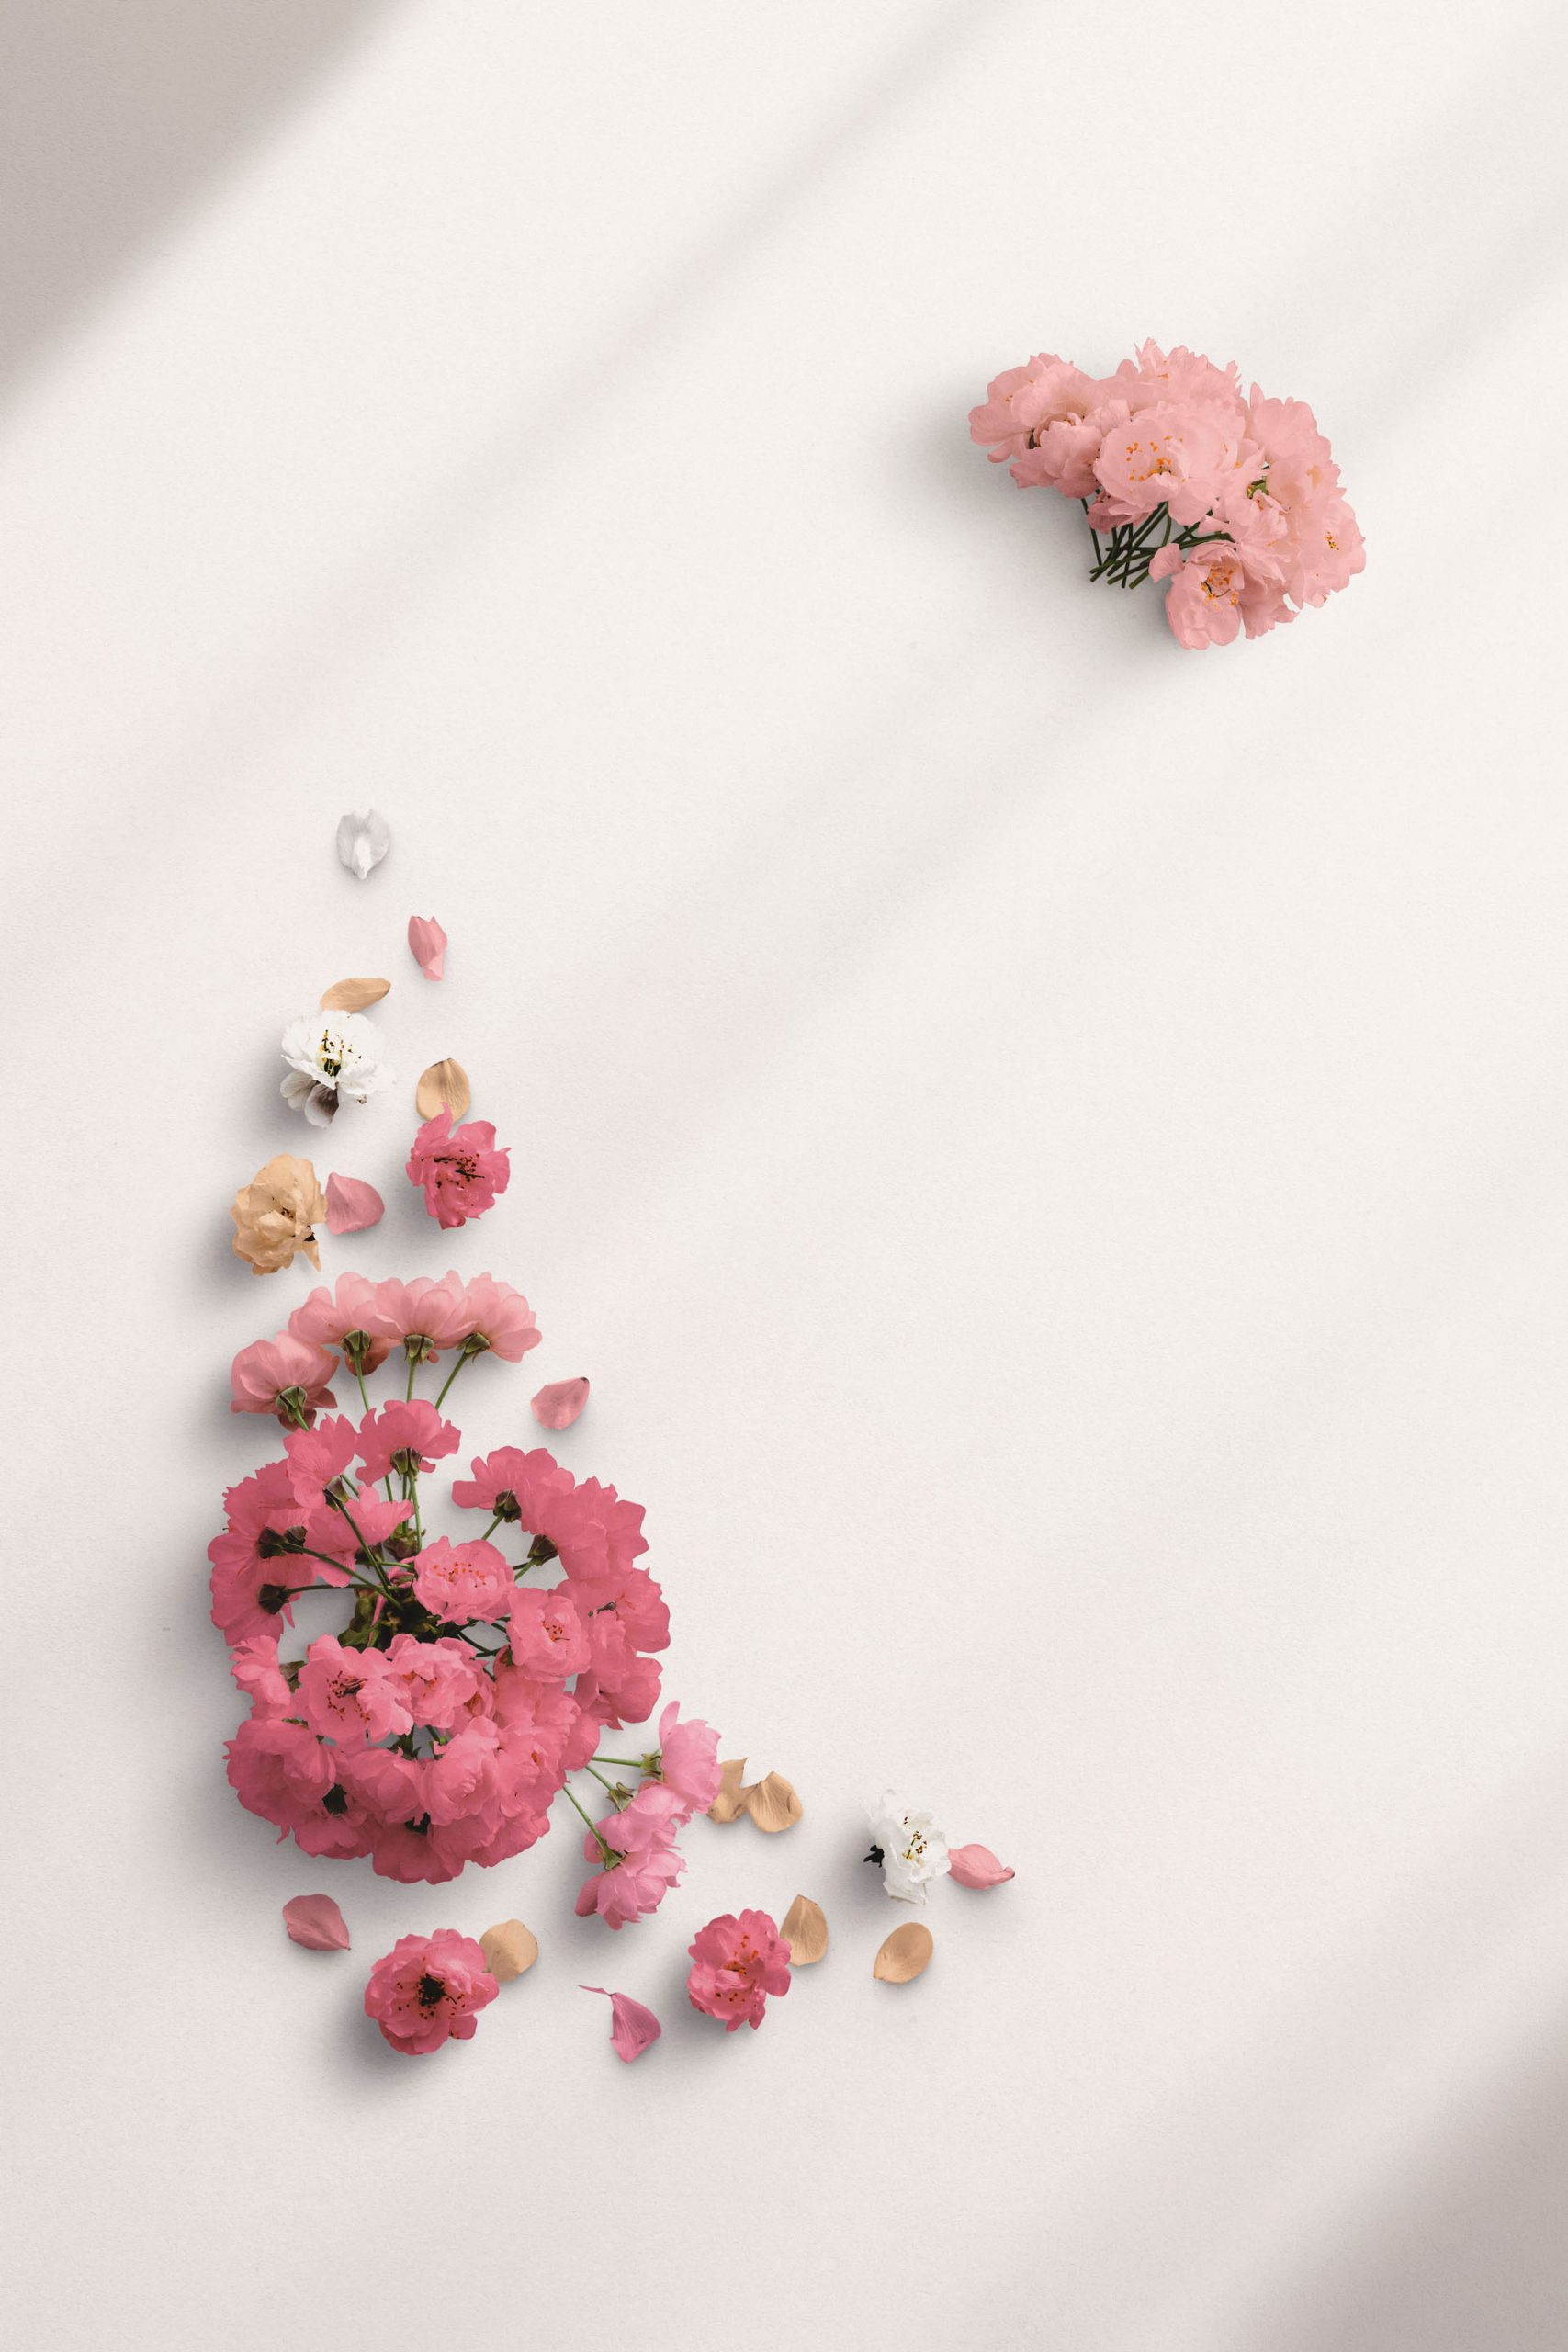 Cherry Blossom Custom Scene Creator Template 4 Thumbnail